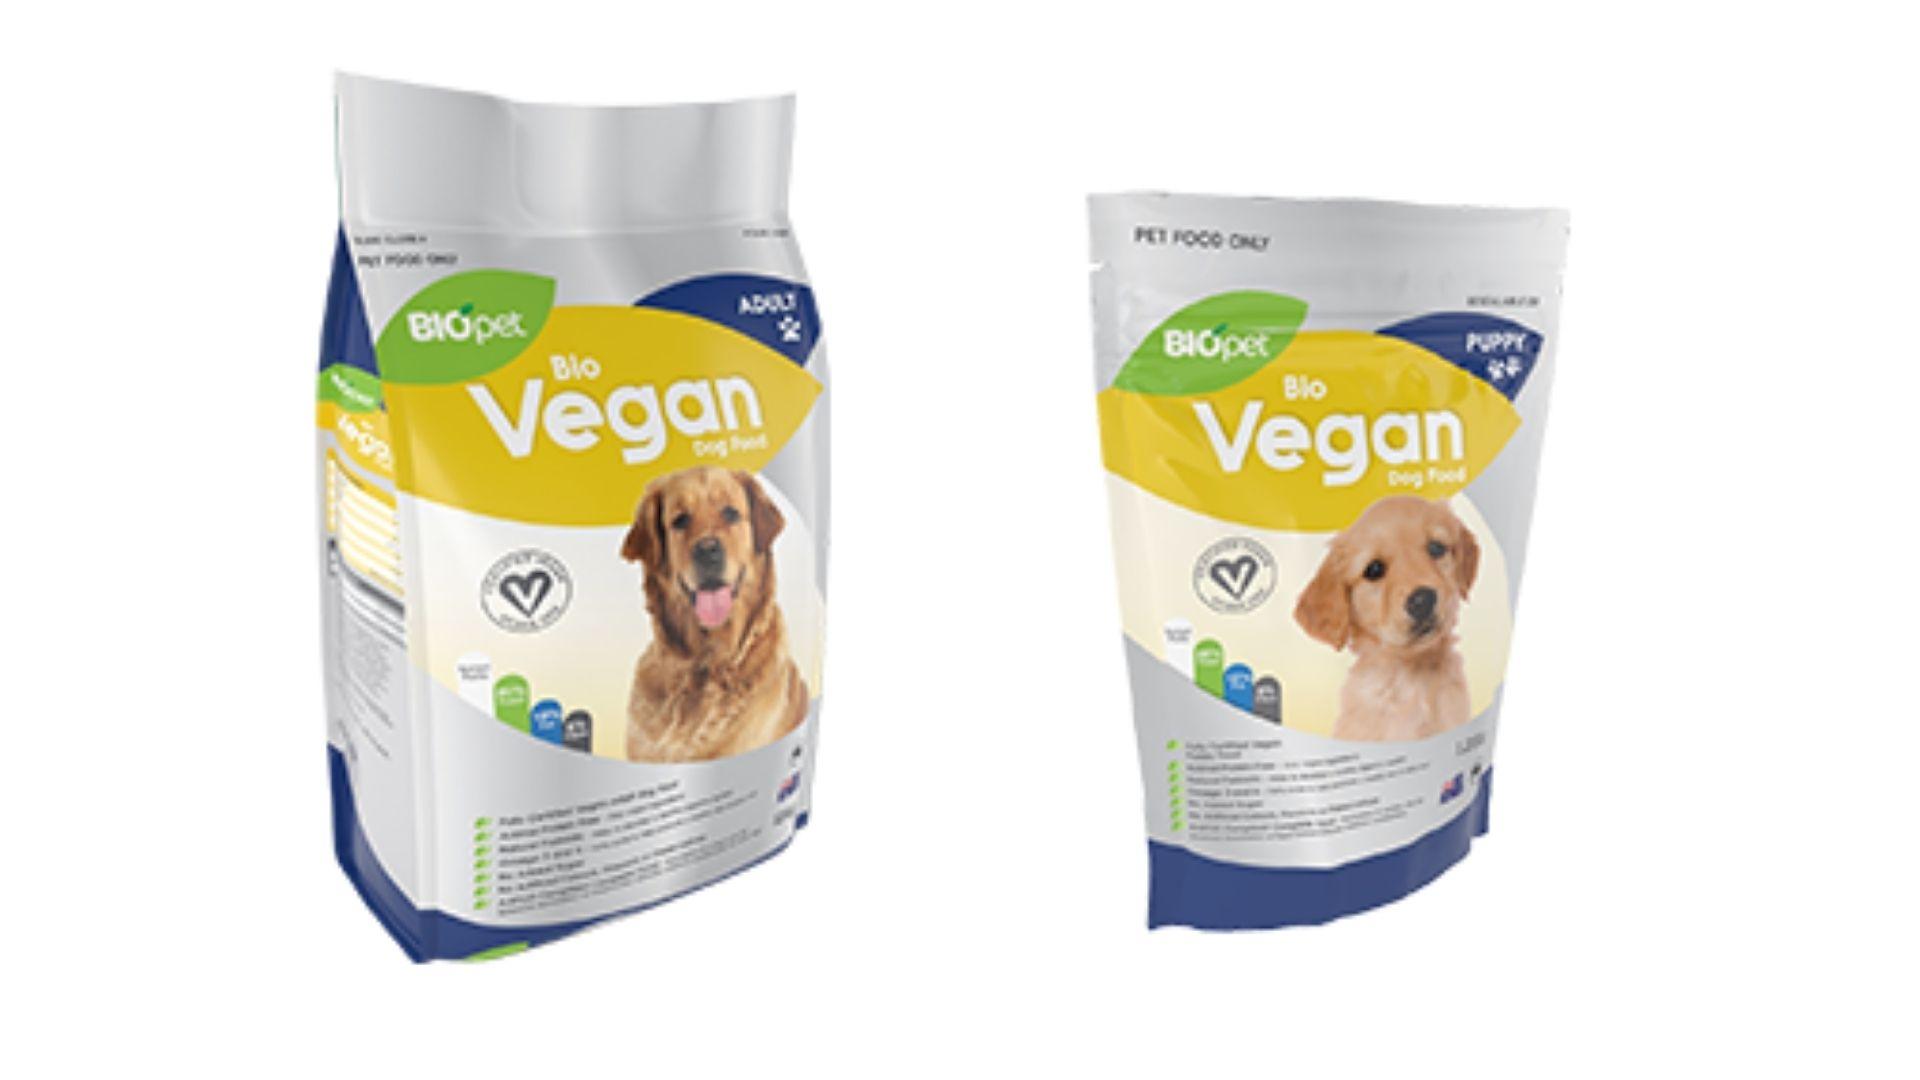 Biopet vegan dog food.